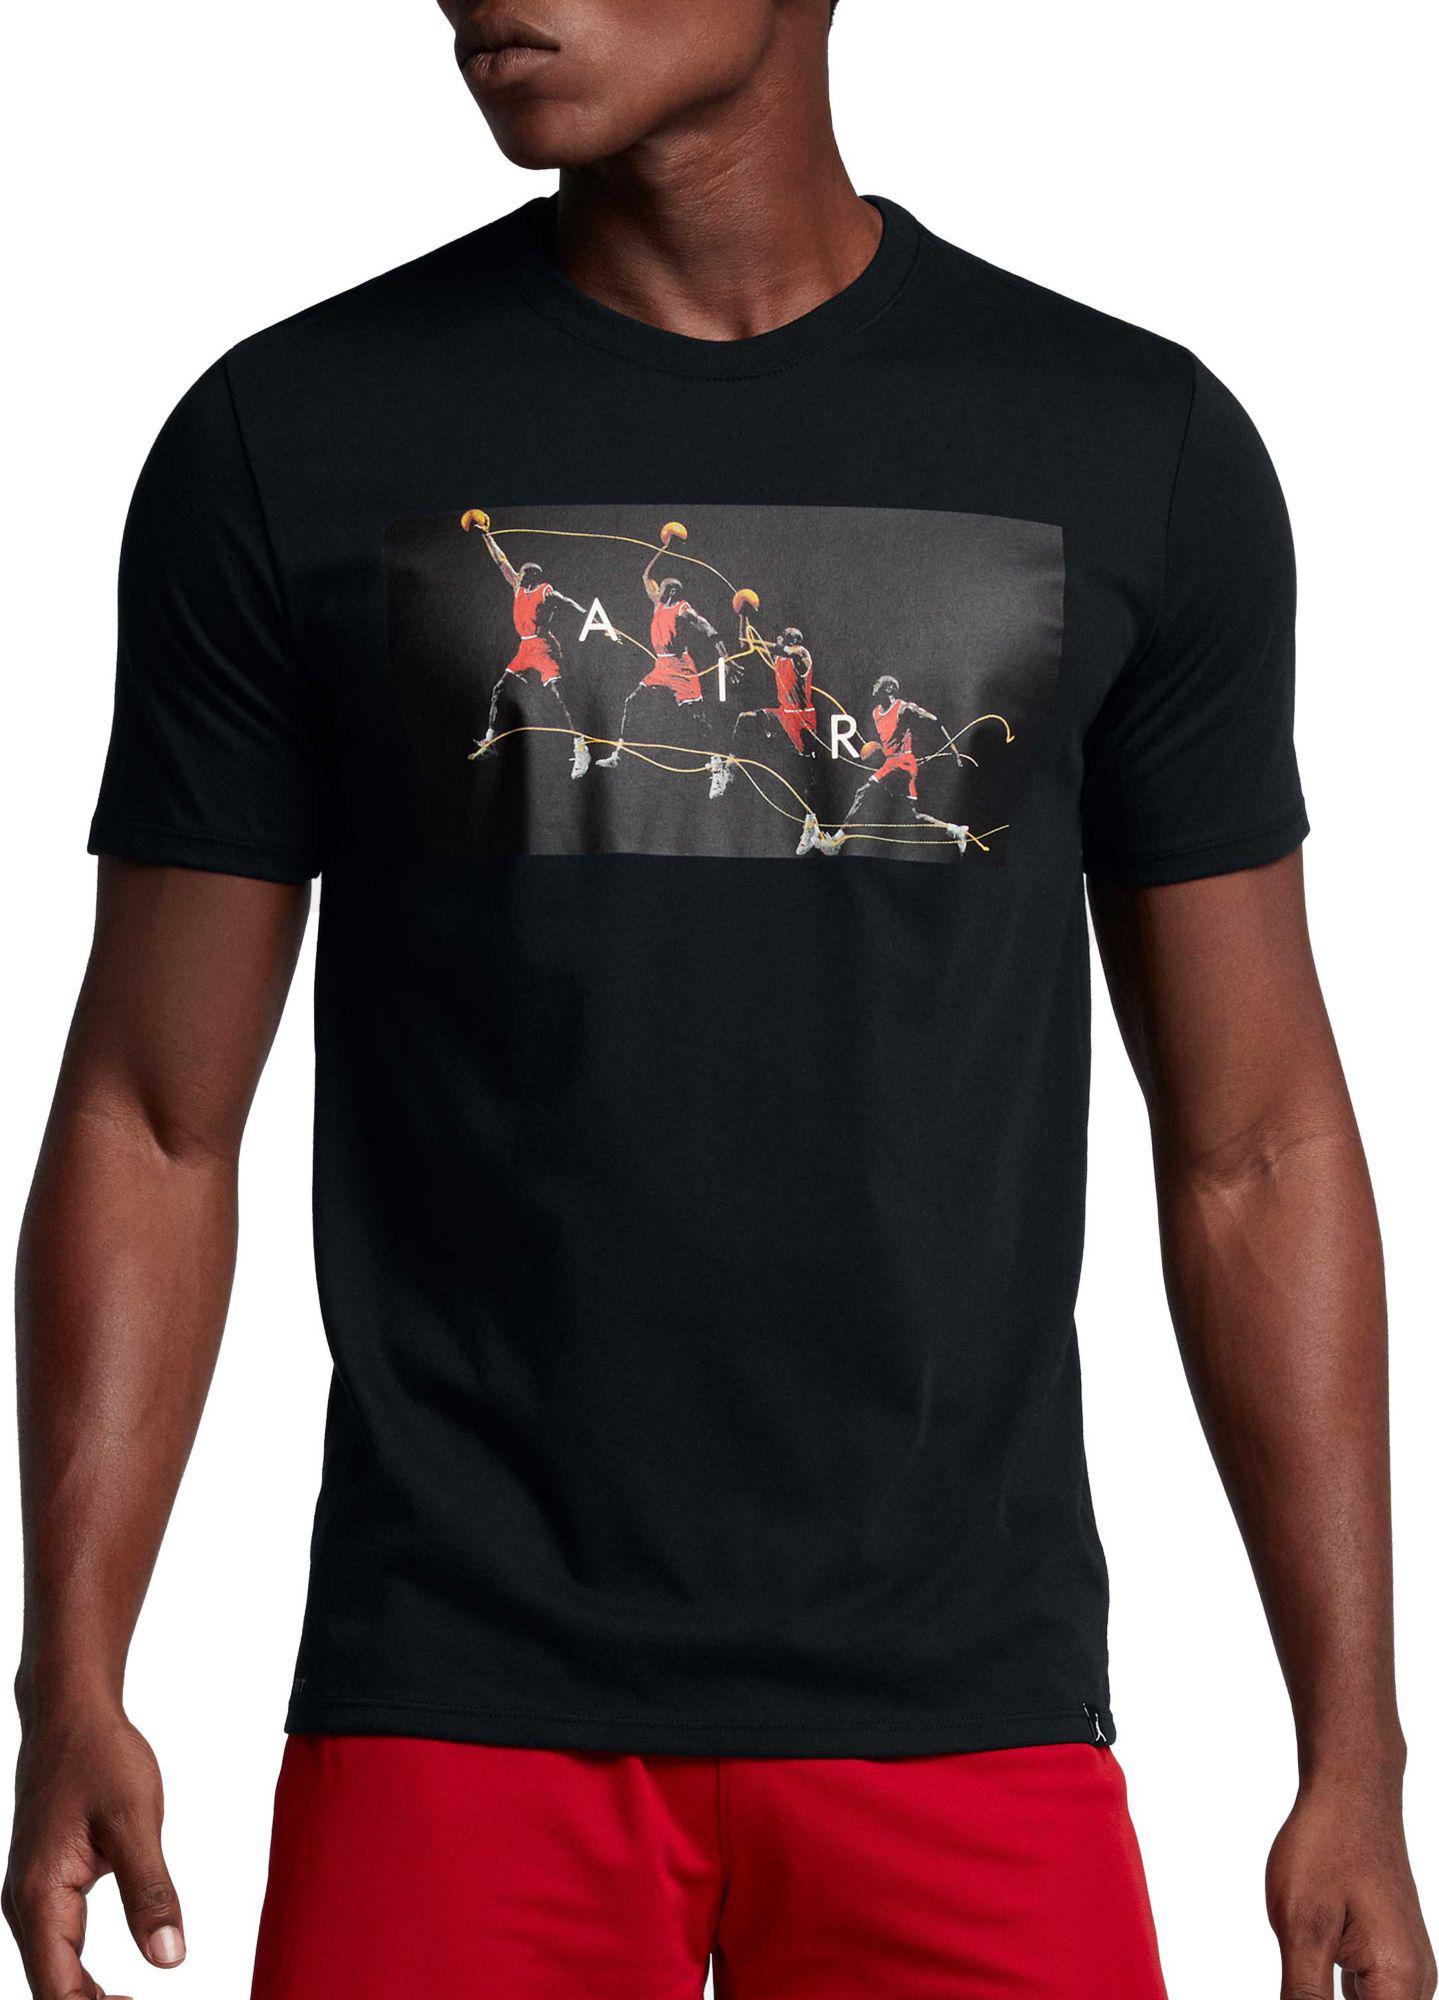 3ef52674135d4a Lyst - Nike Jordan Dry Flight Photo Basketball Graphic T-shirt in ...